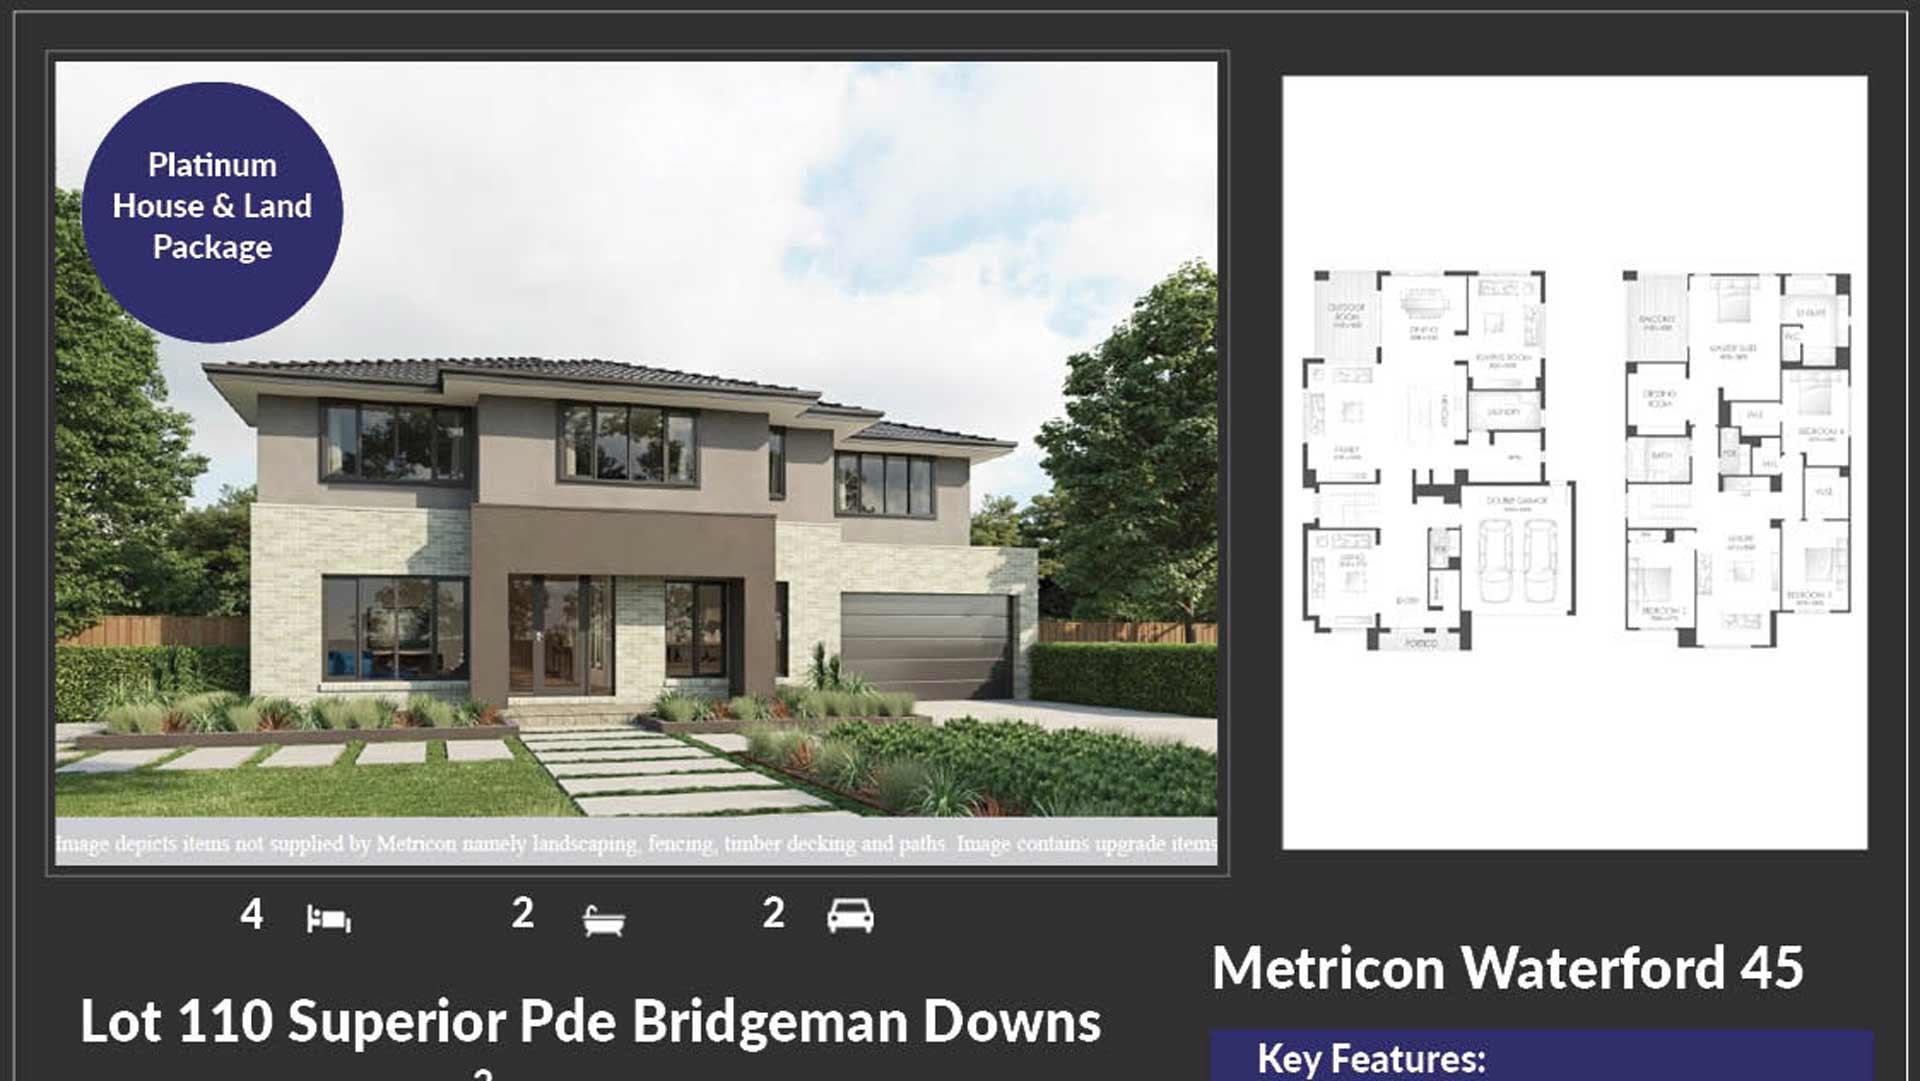 Metricon to build luxury homes at Bridgeman Hilltop estate